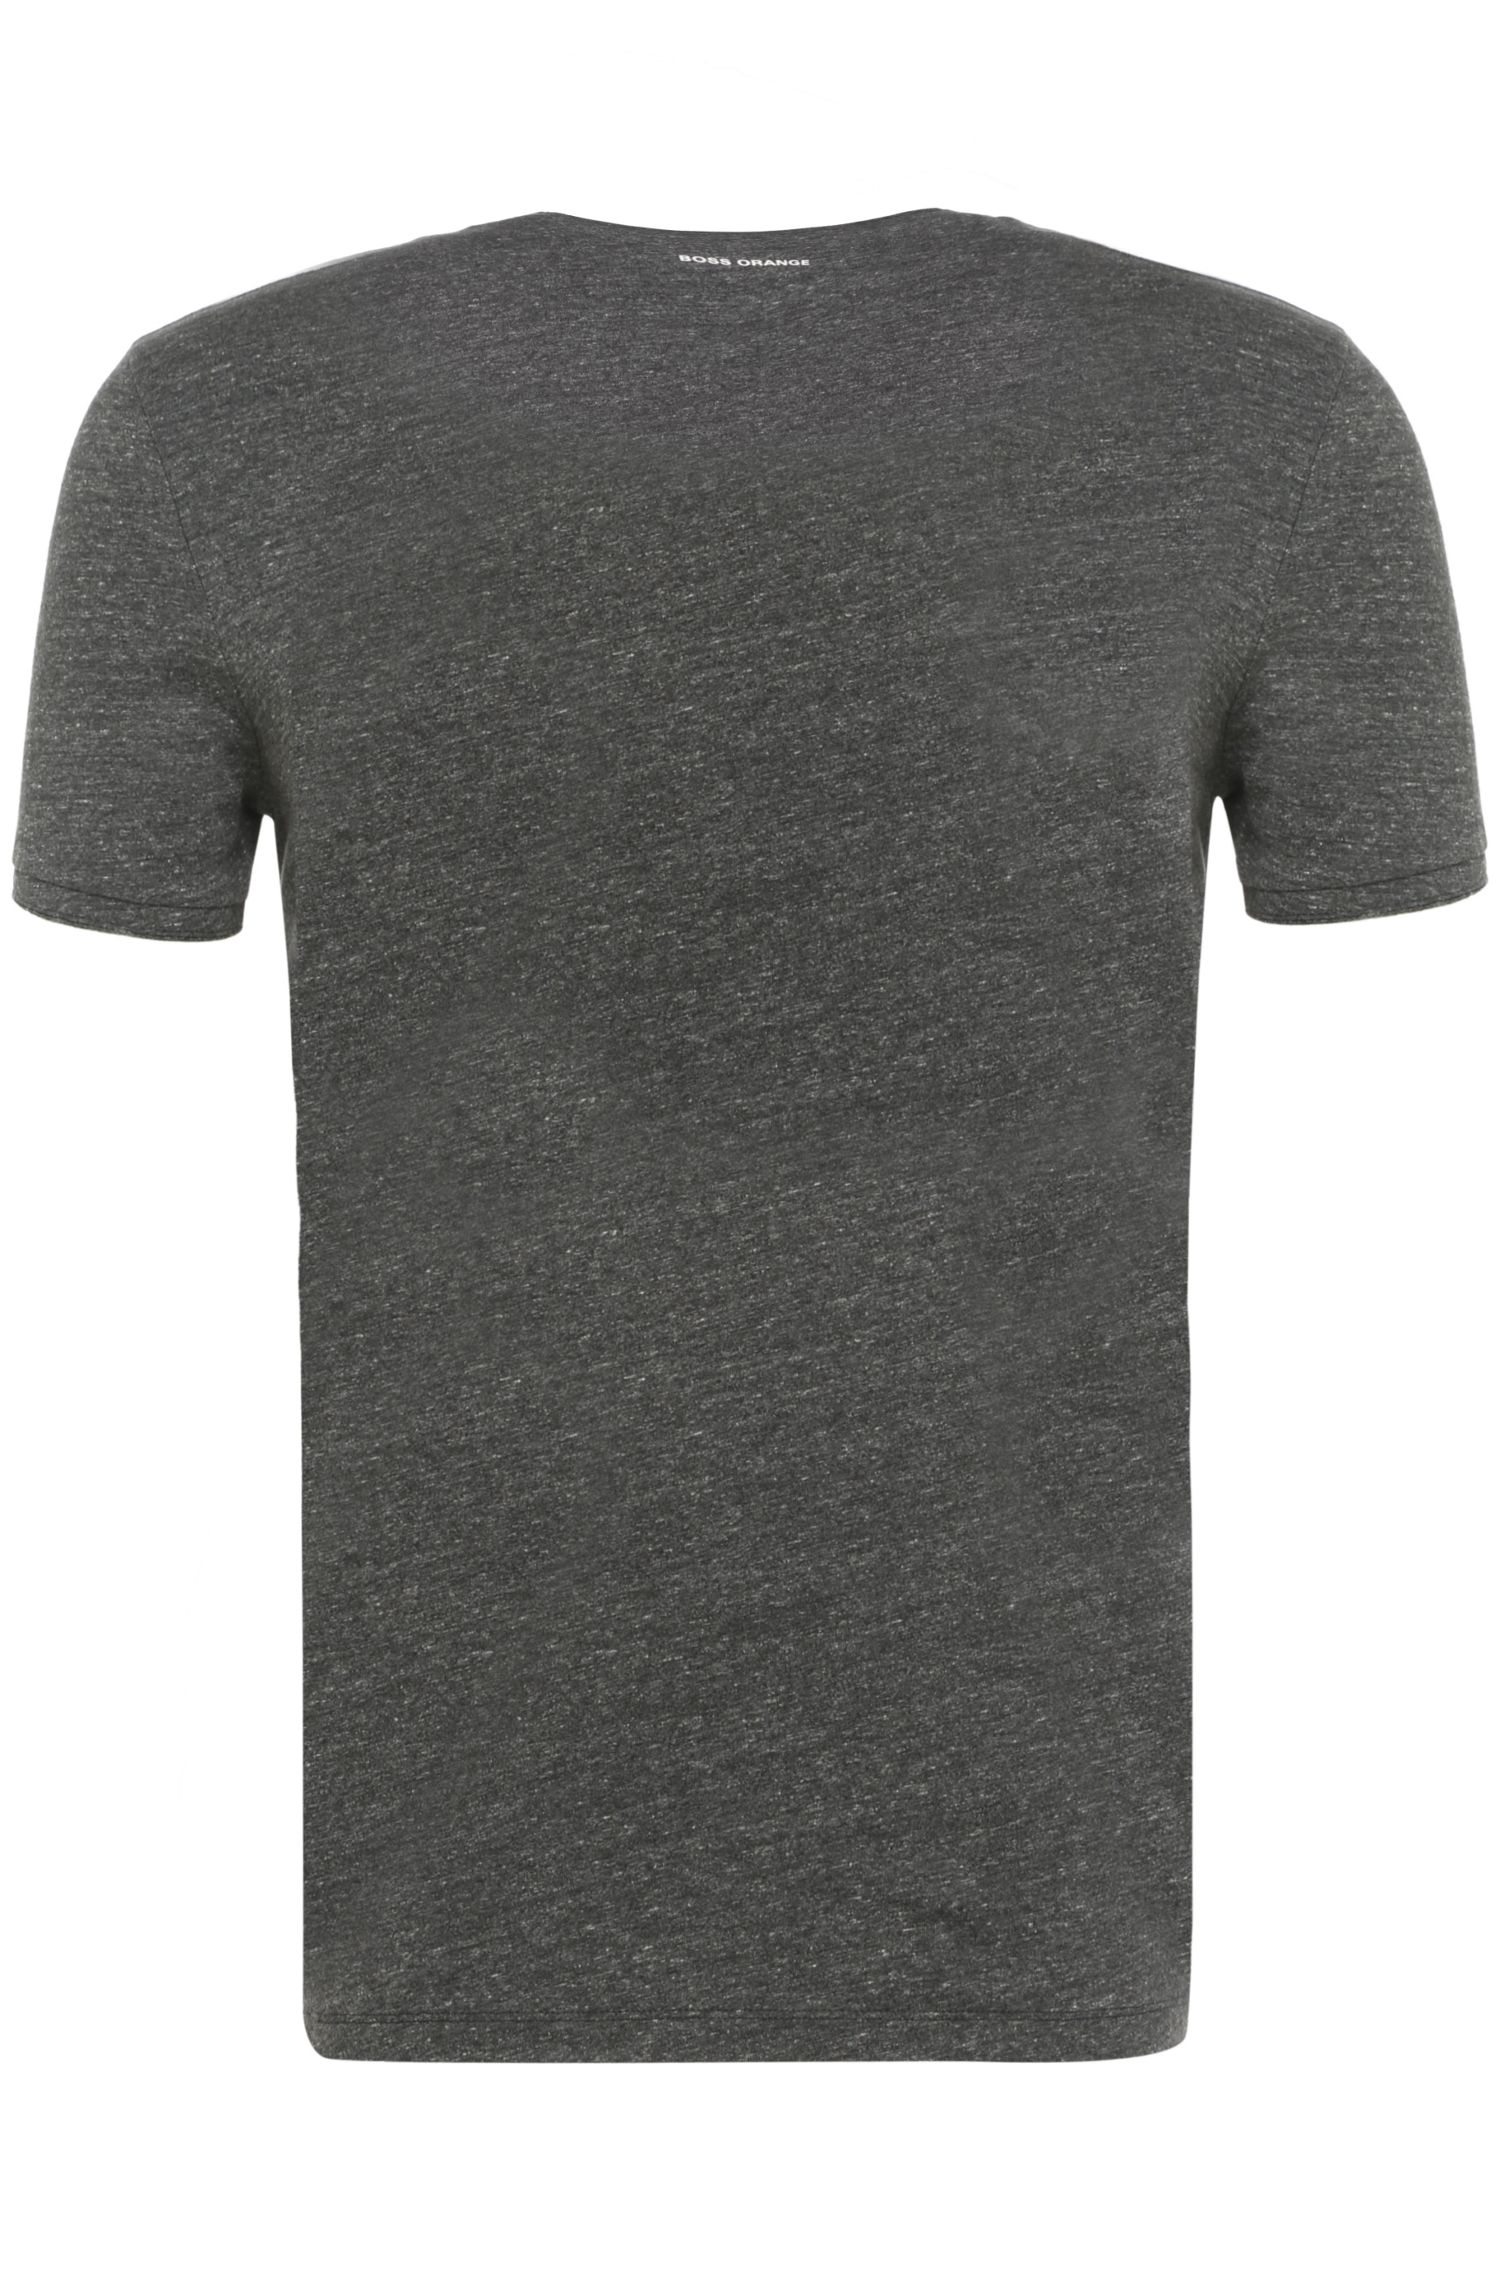 Baumwoll-T-Shirt mit Frontprint: ´Tye`